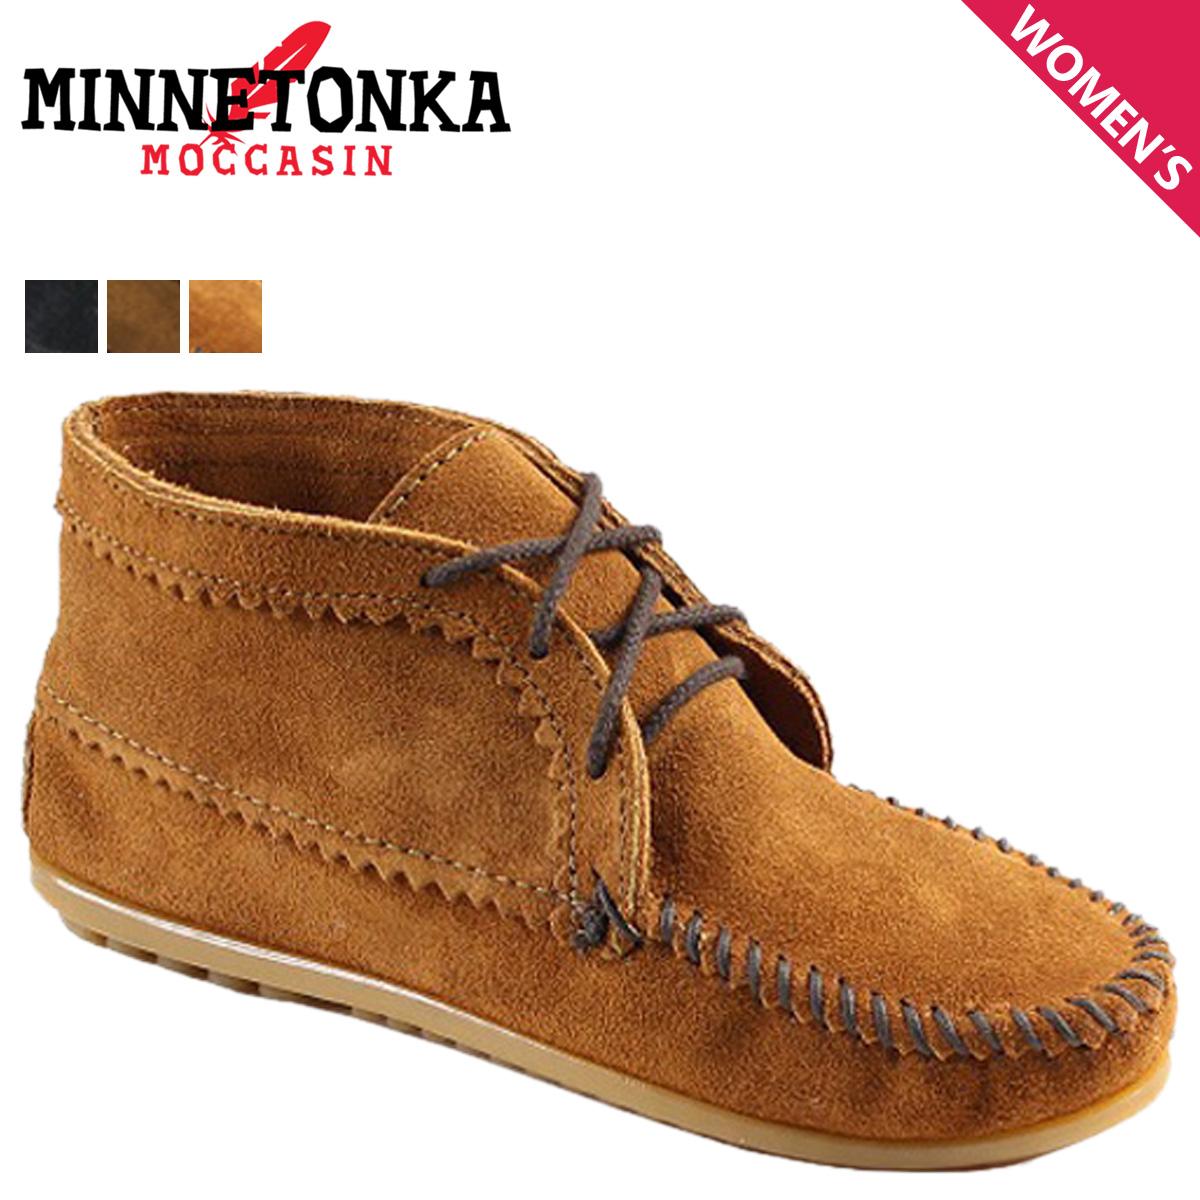 Allsports Minnetonka Minnetonka Suede Ankle Bootie Suede Ankle